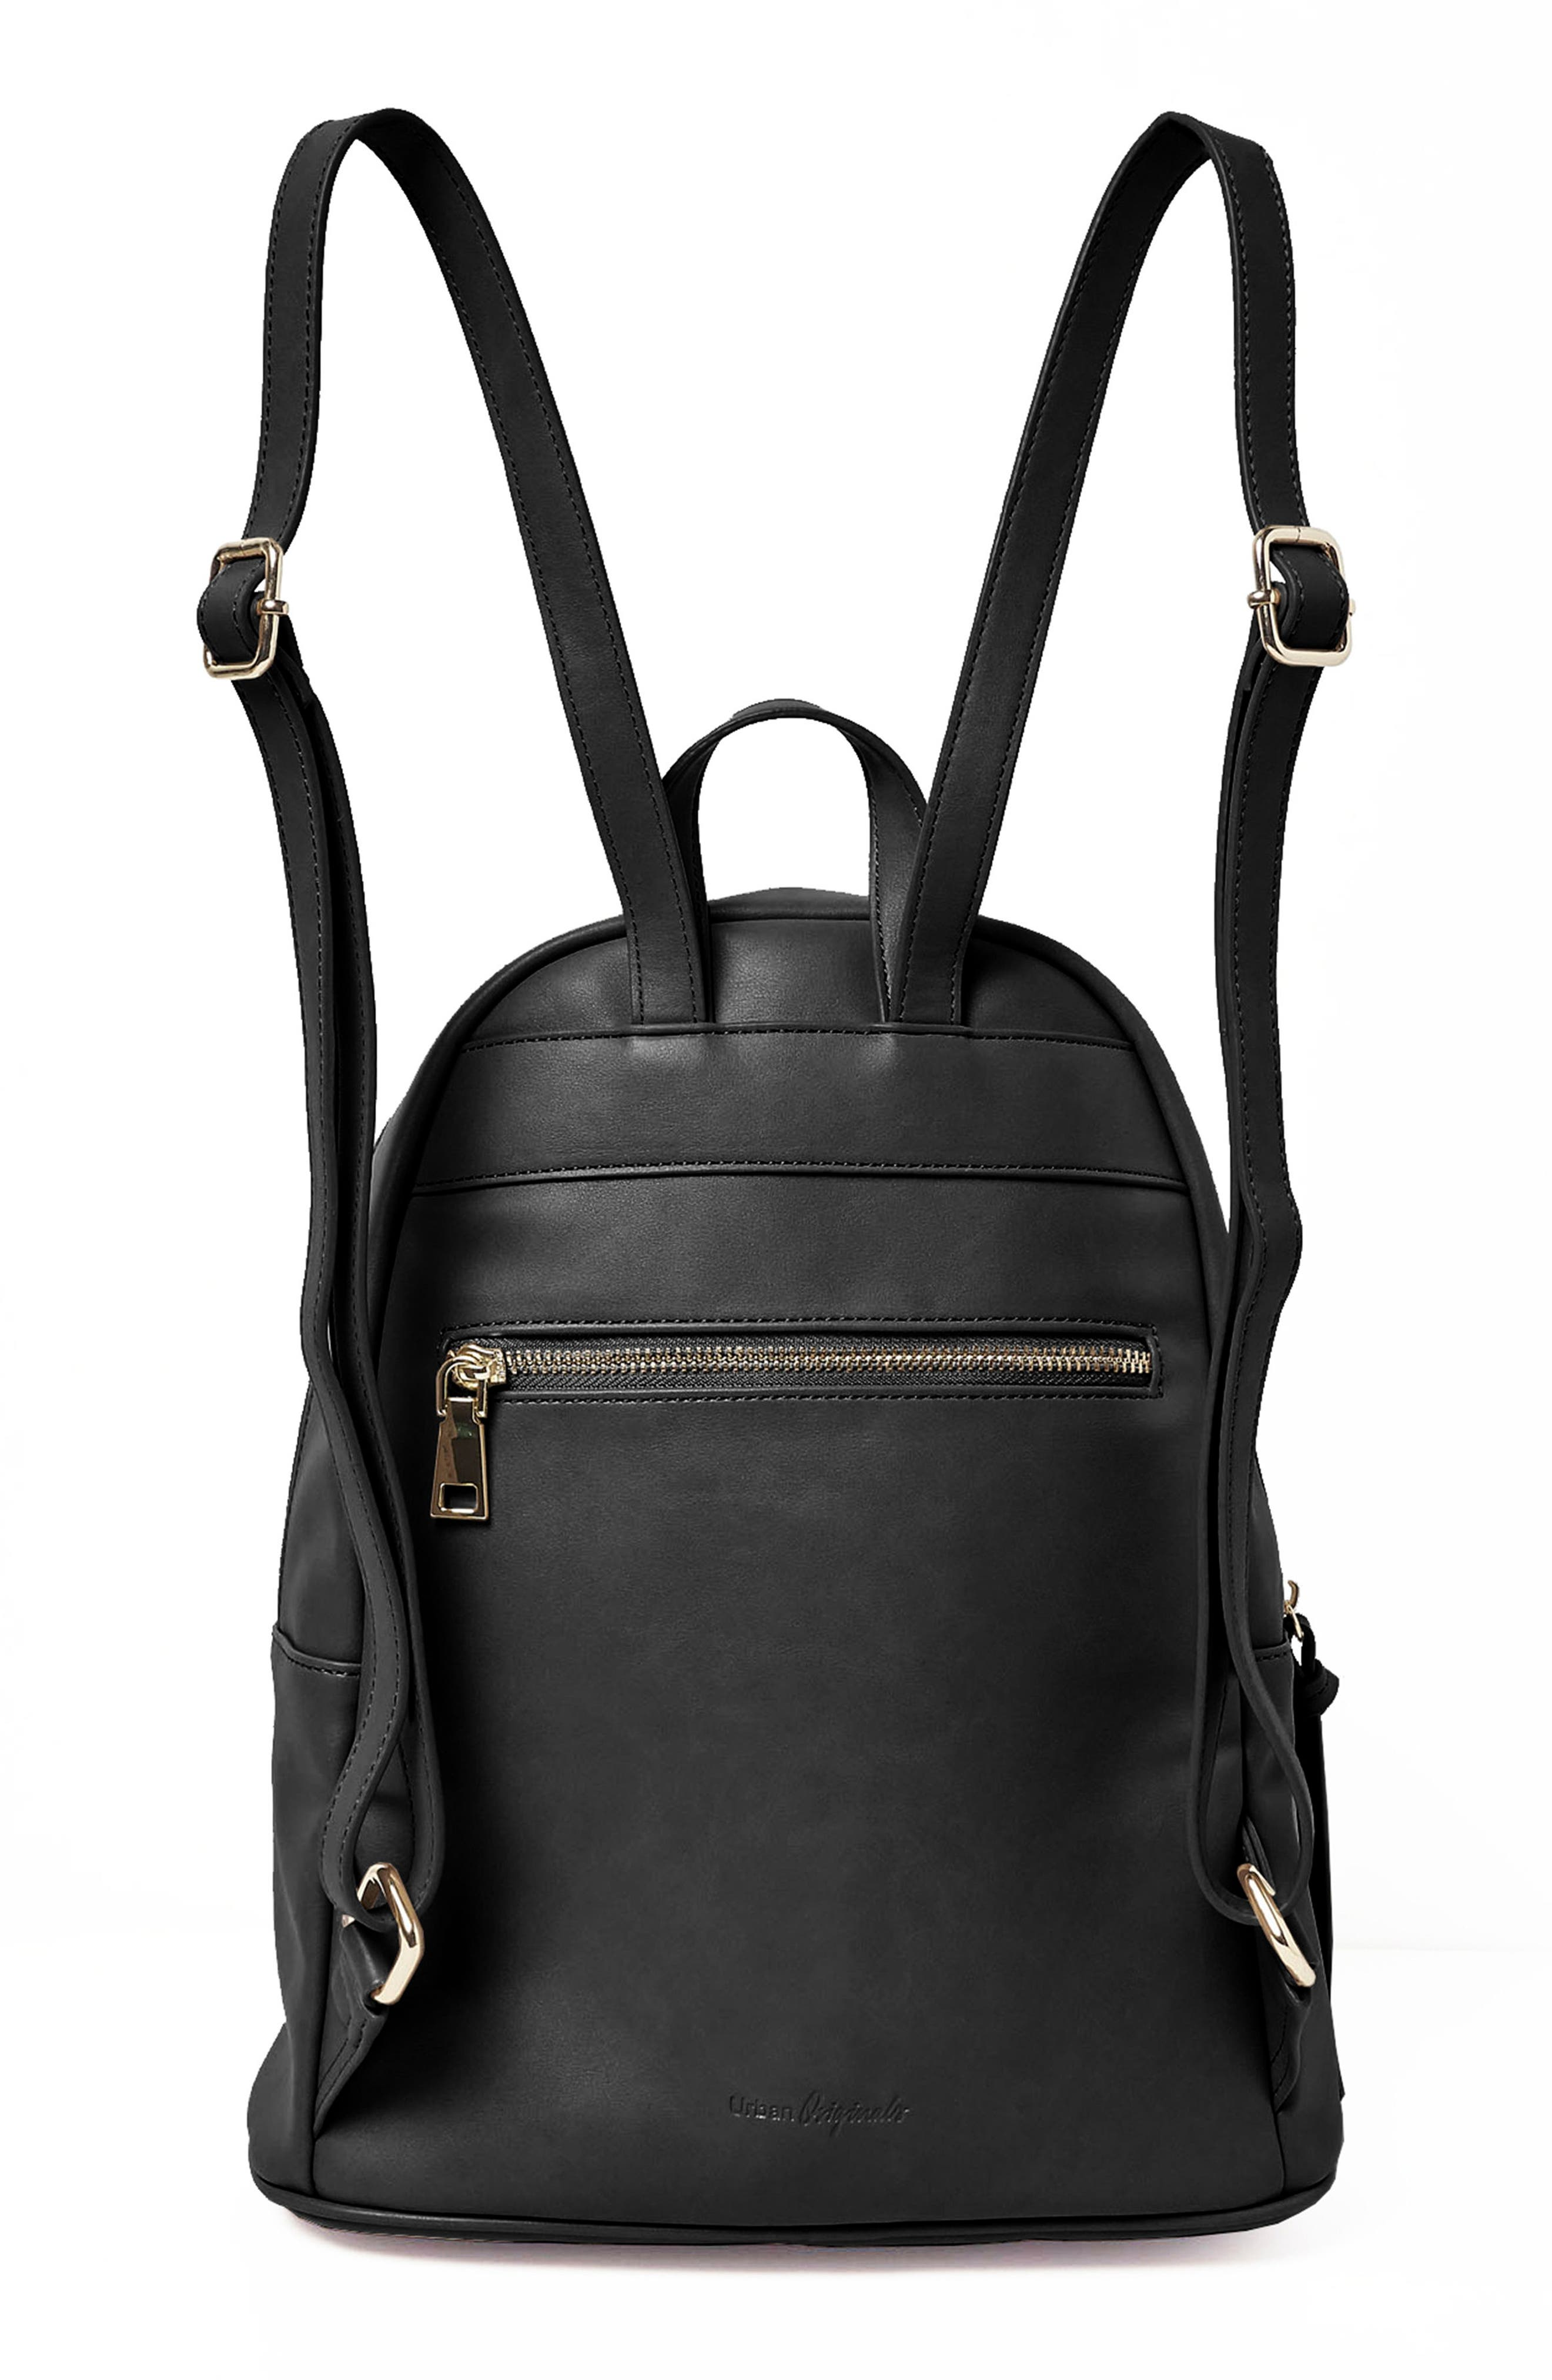 Sublime Vegan Leather Backpack,                             Alternate thumbnail 2, color,                             001